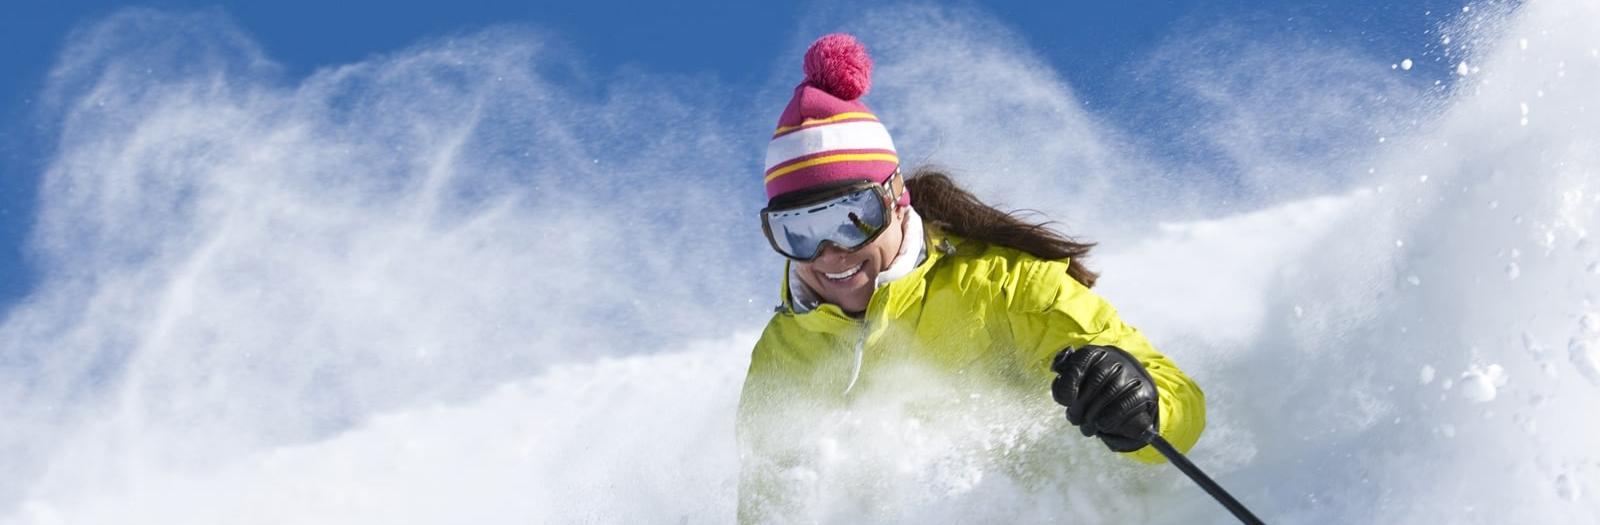 ski.com faq, first time ski vacation, first time skiing